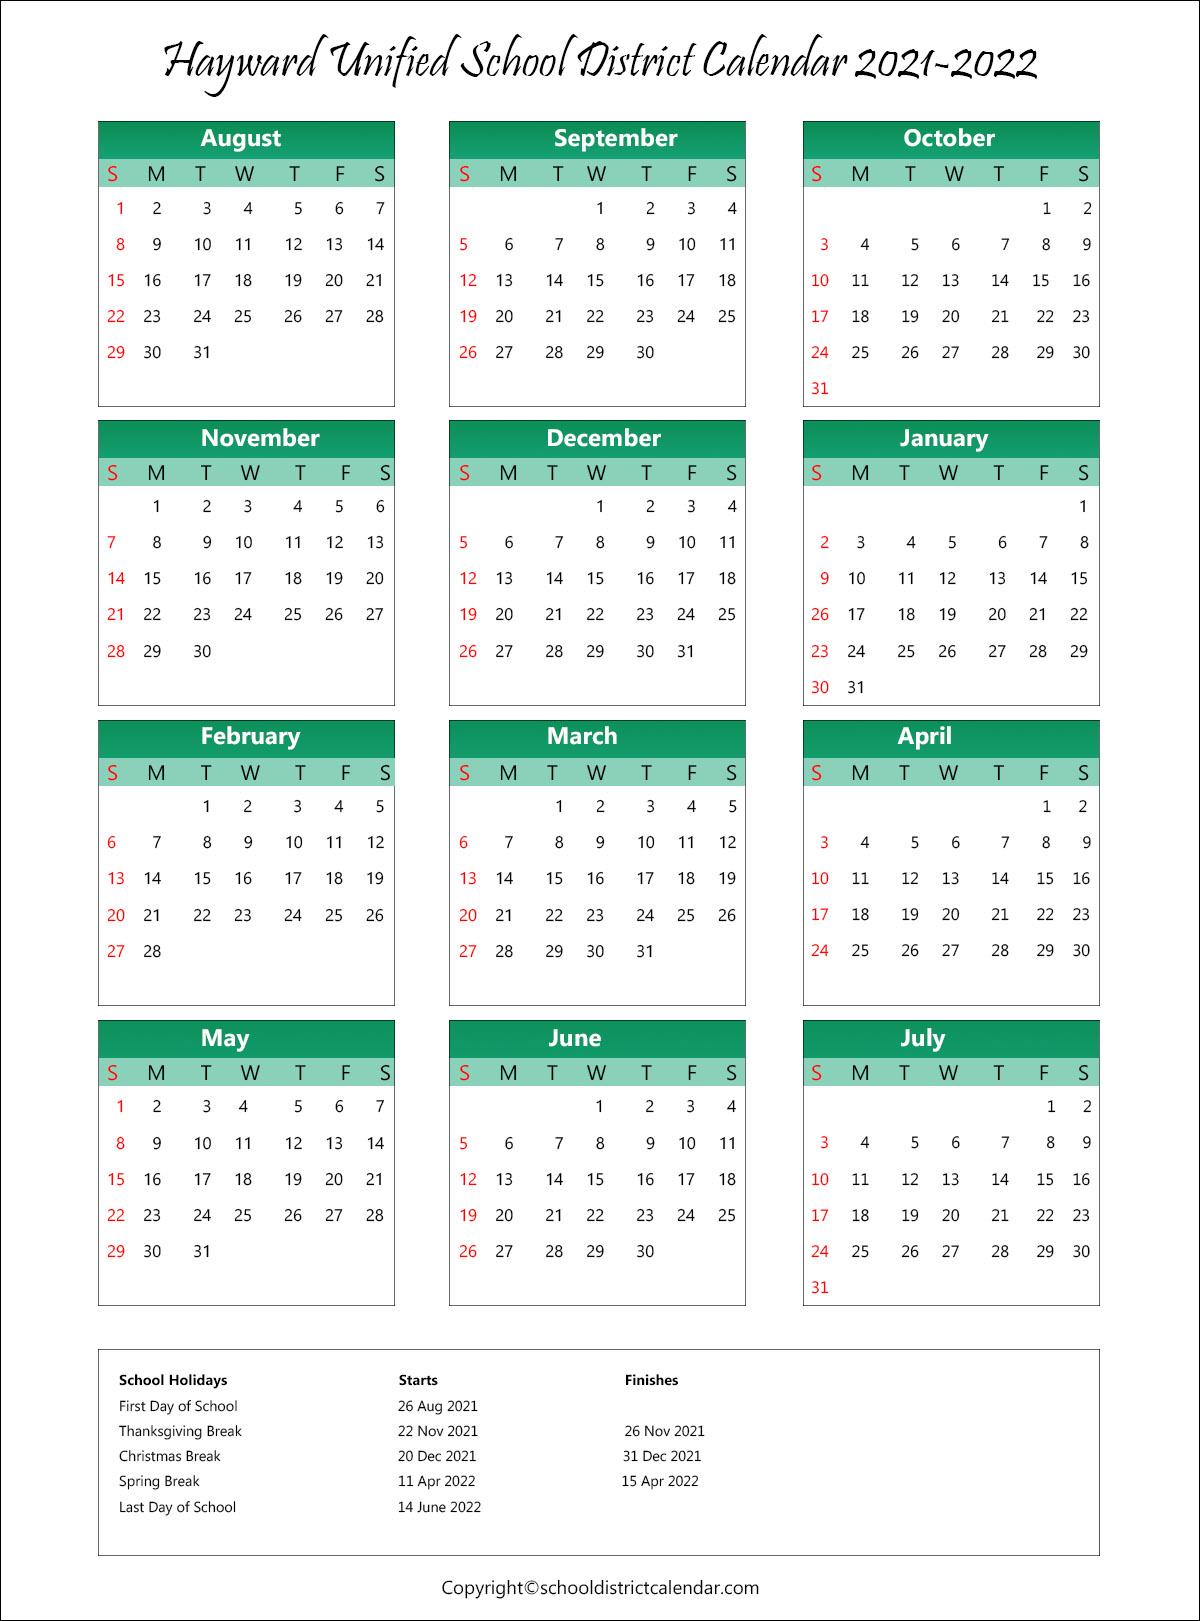 Hayward Unified School District, California Calendar Holidays 2021